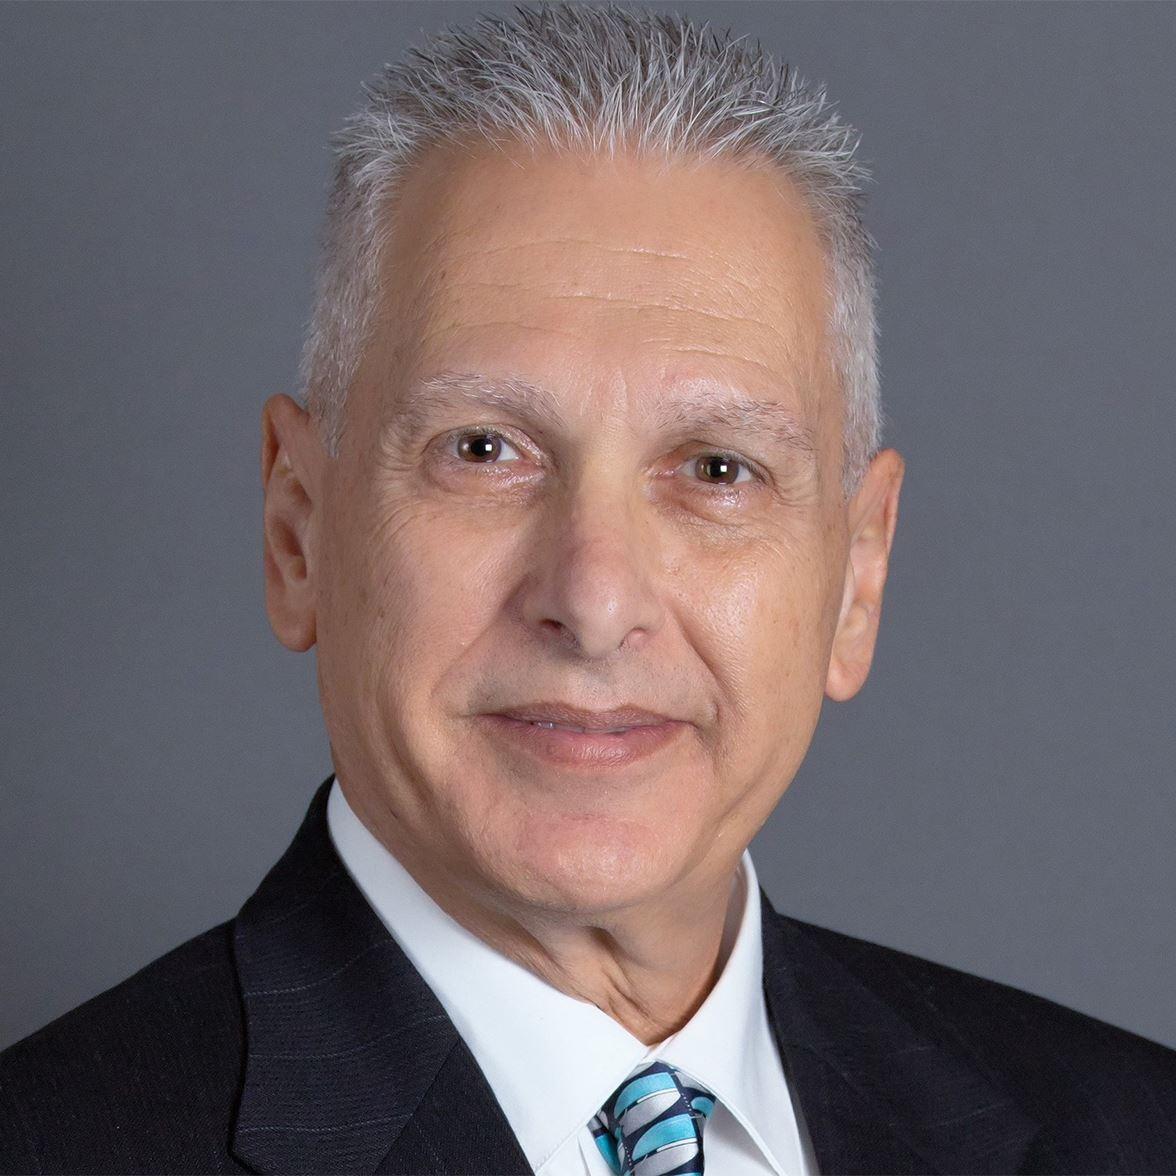 Hon. Barry L. Gordon